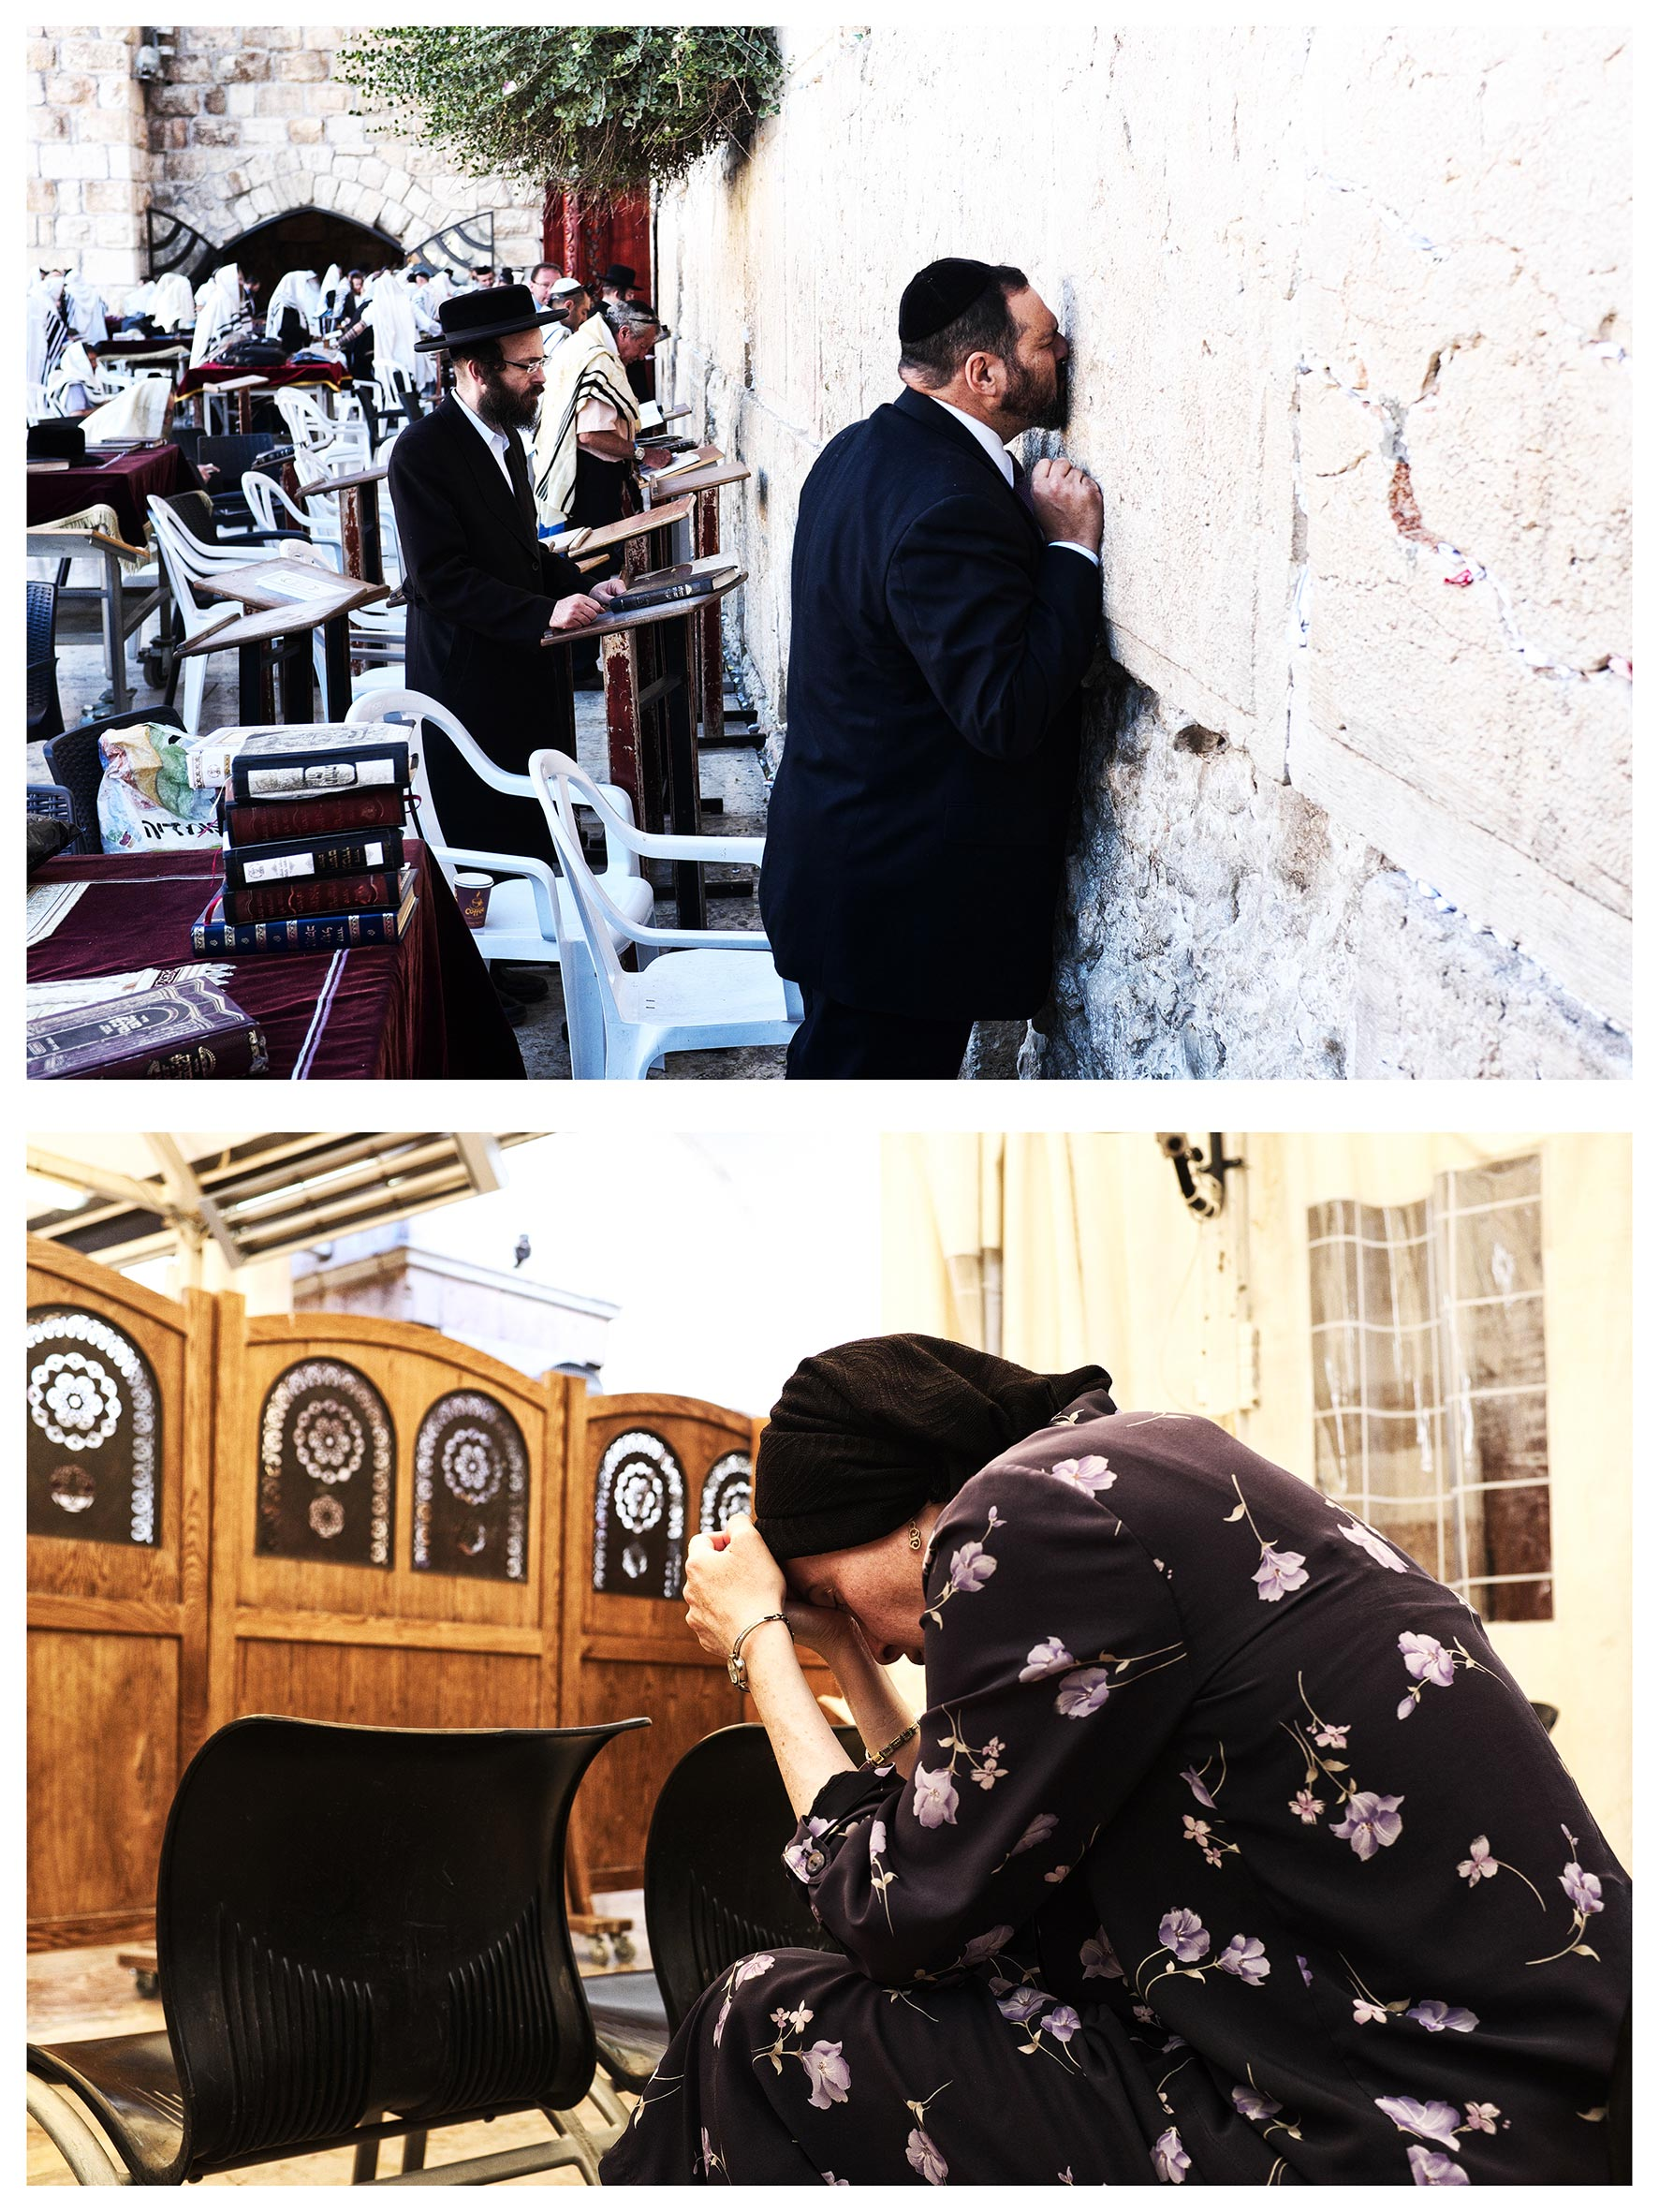 #au milieu un mur 10. Jérusalem / Hébron